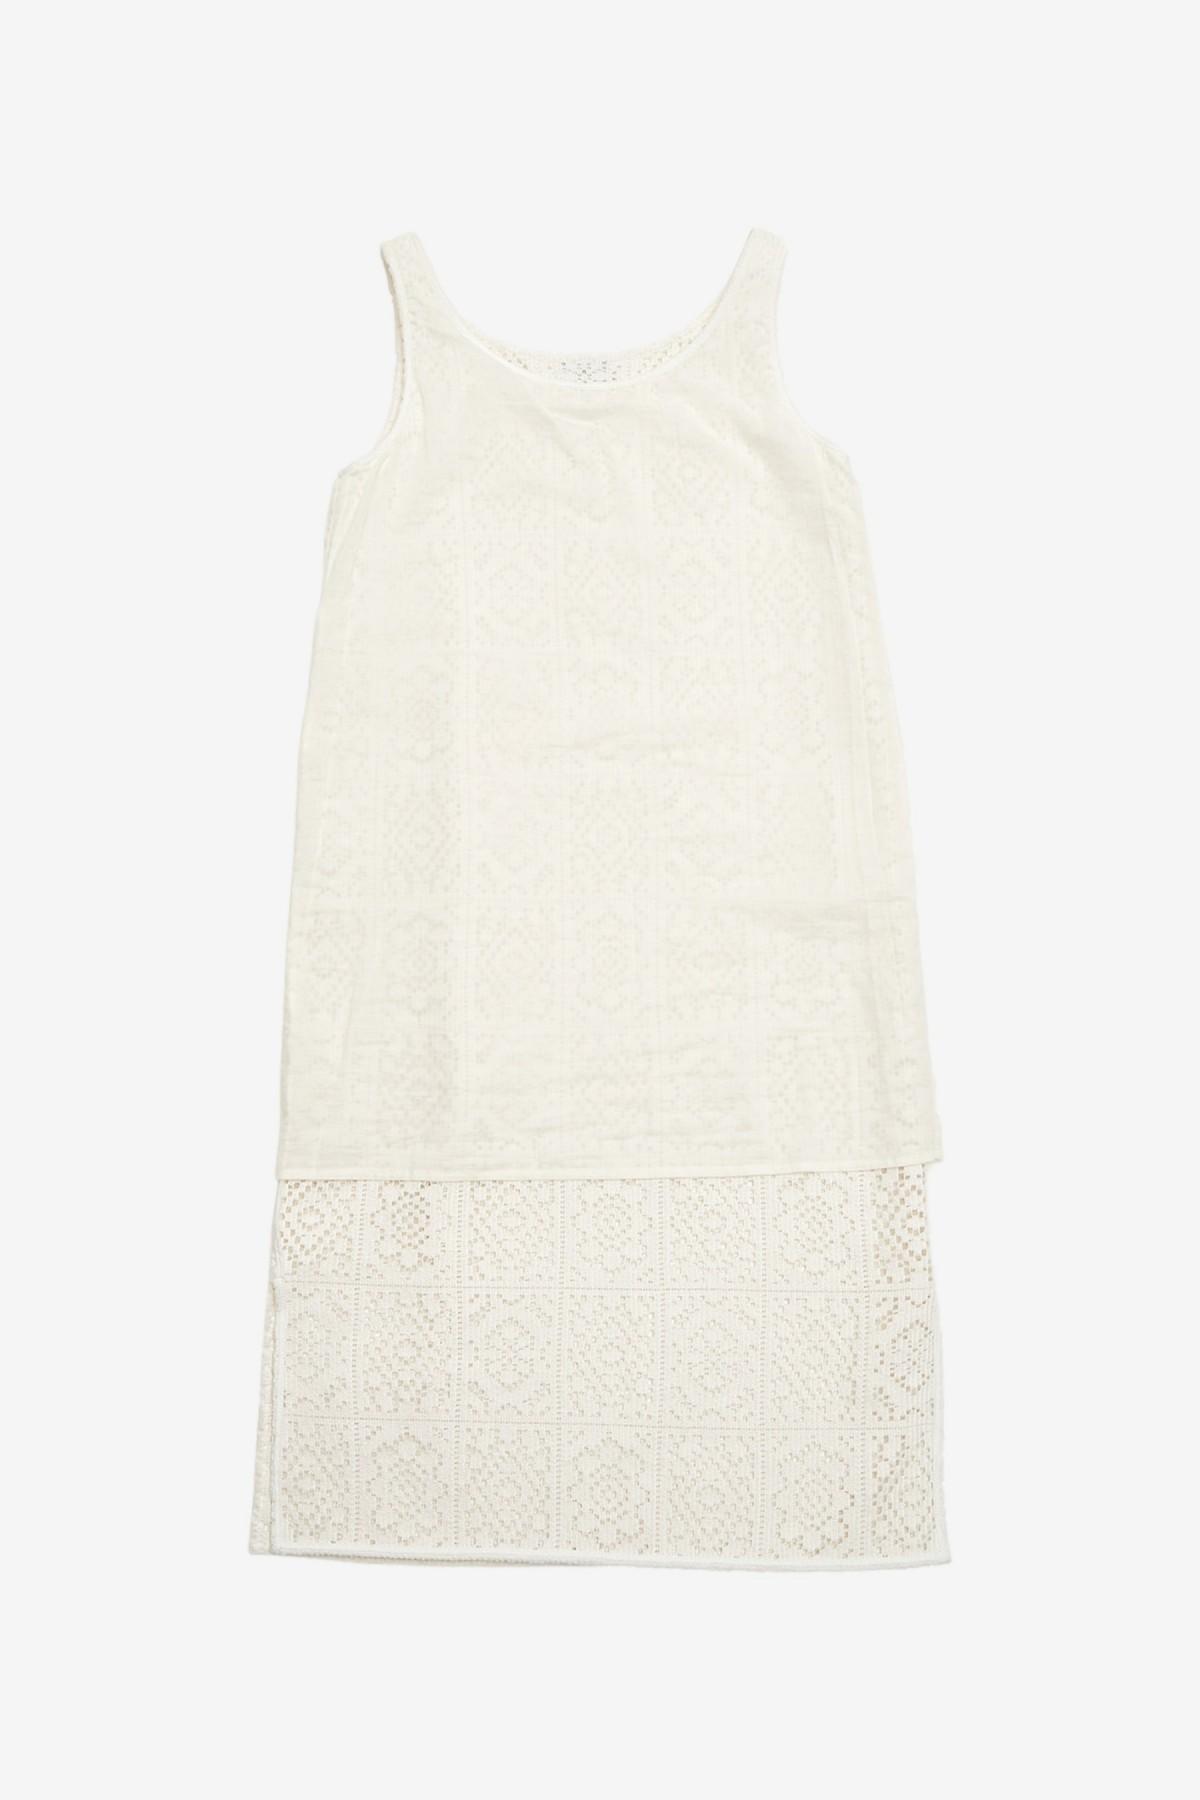 Amomento Crochet Dress in Ivory